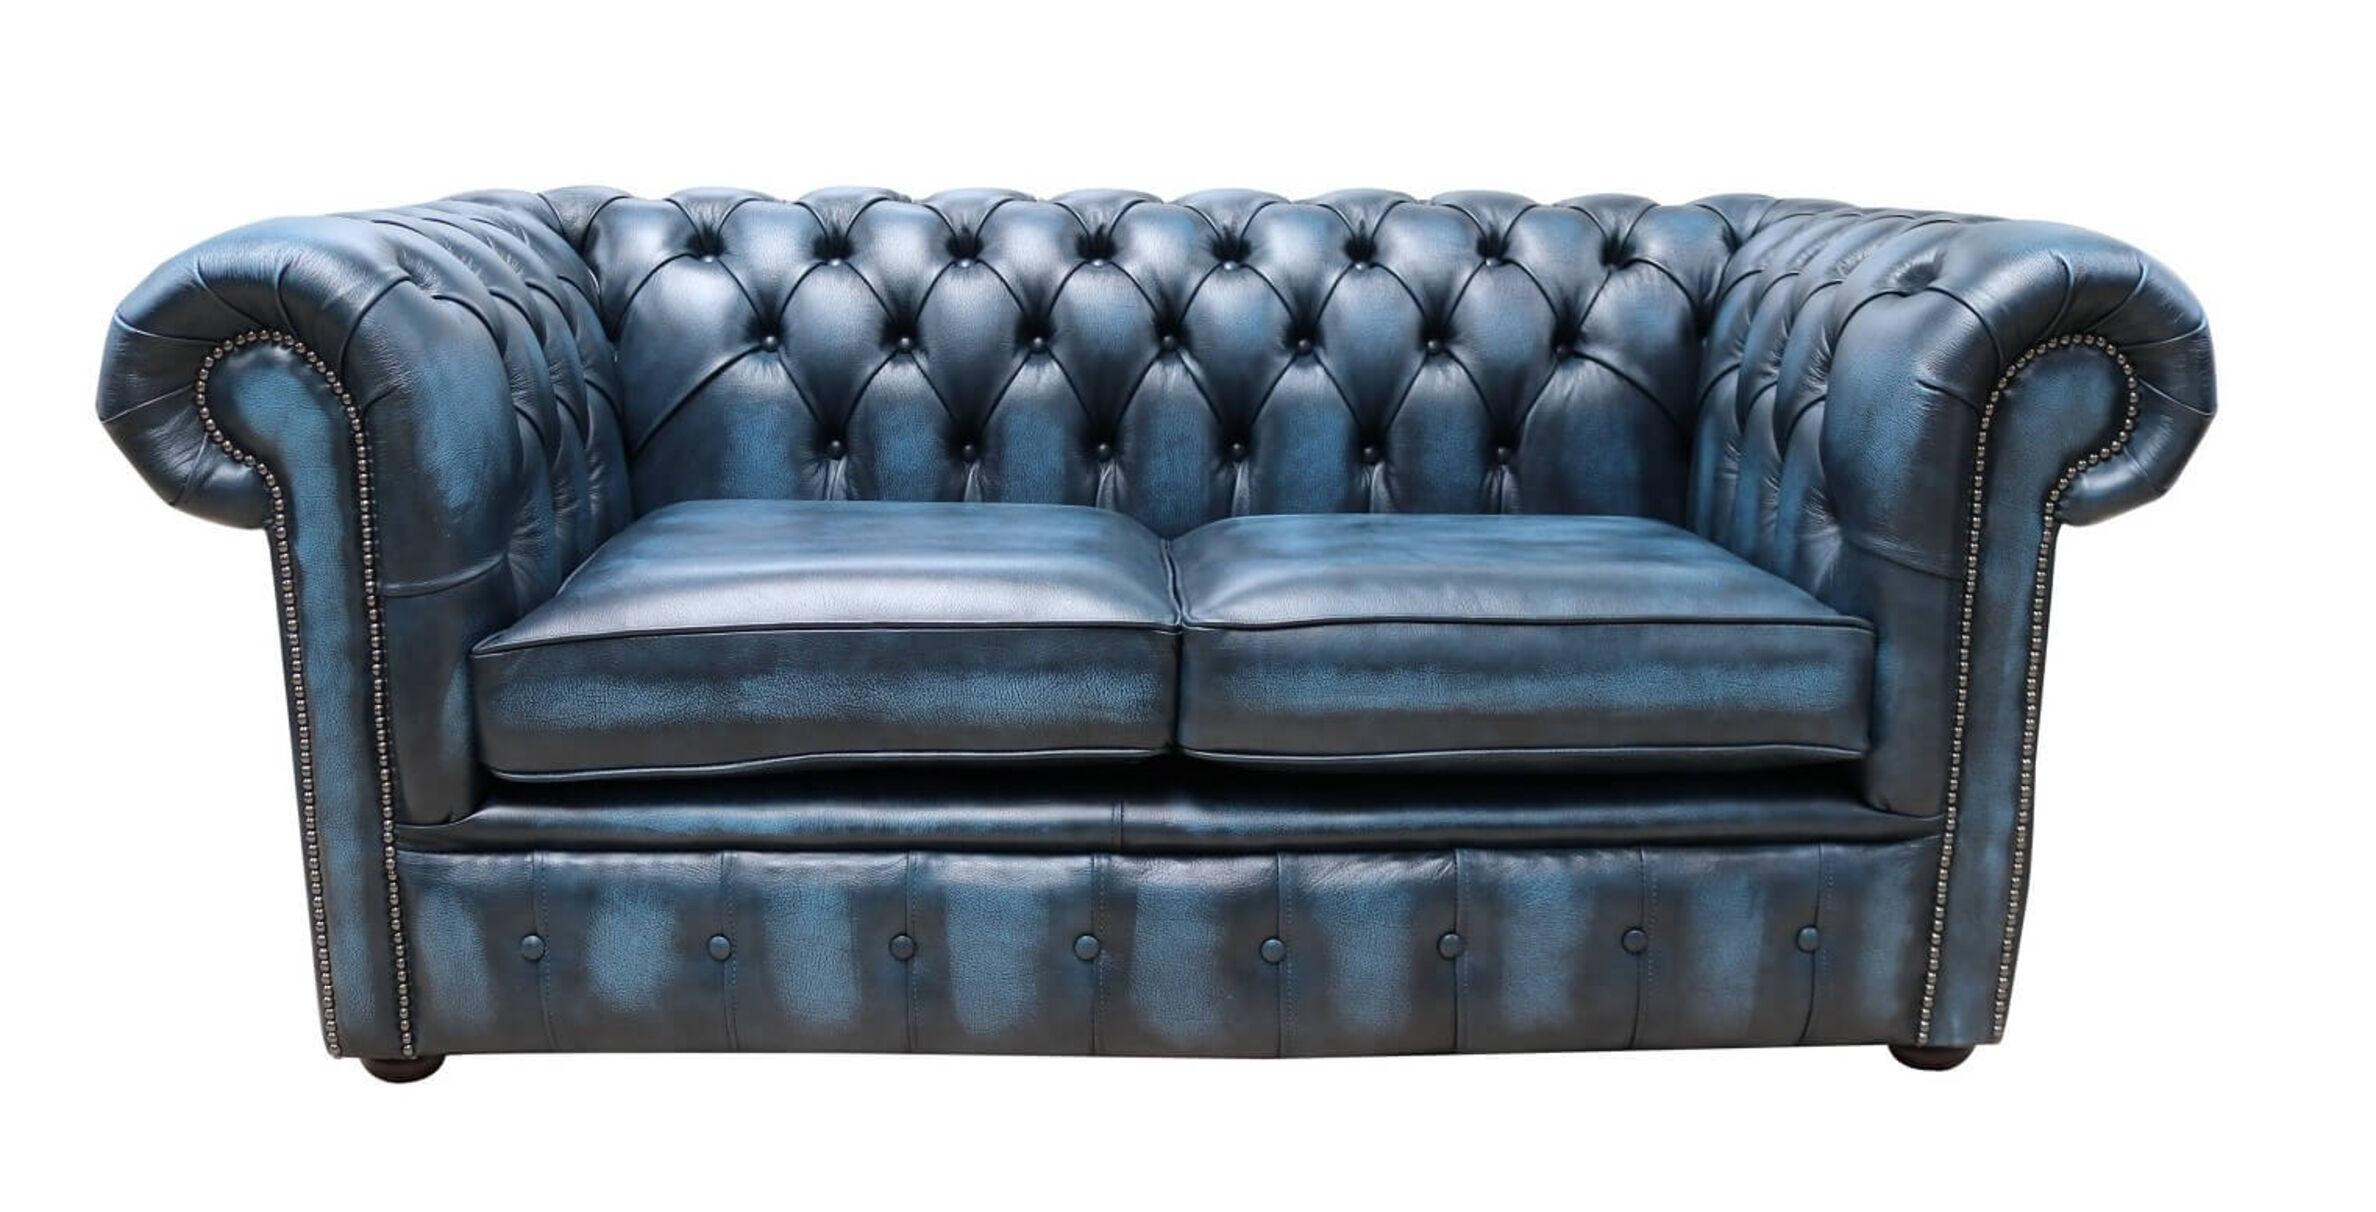 Buy Blue Loveseat Leather Chesterfield Settee Designersofas4u